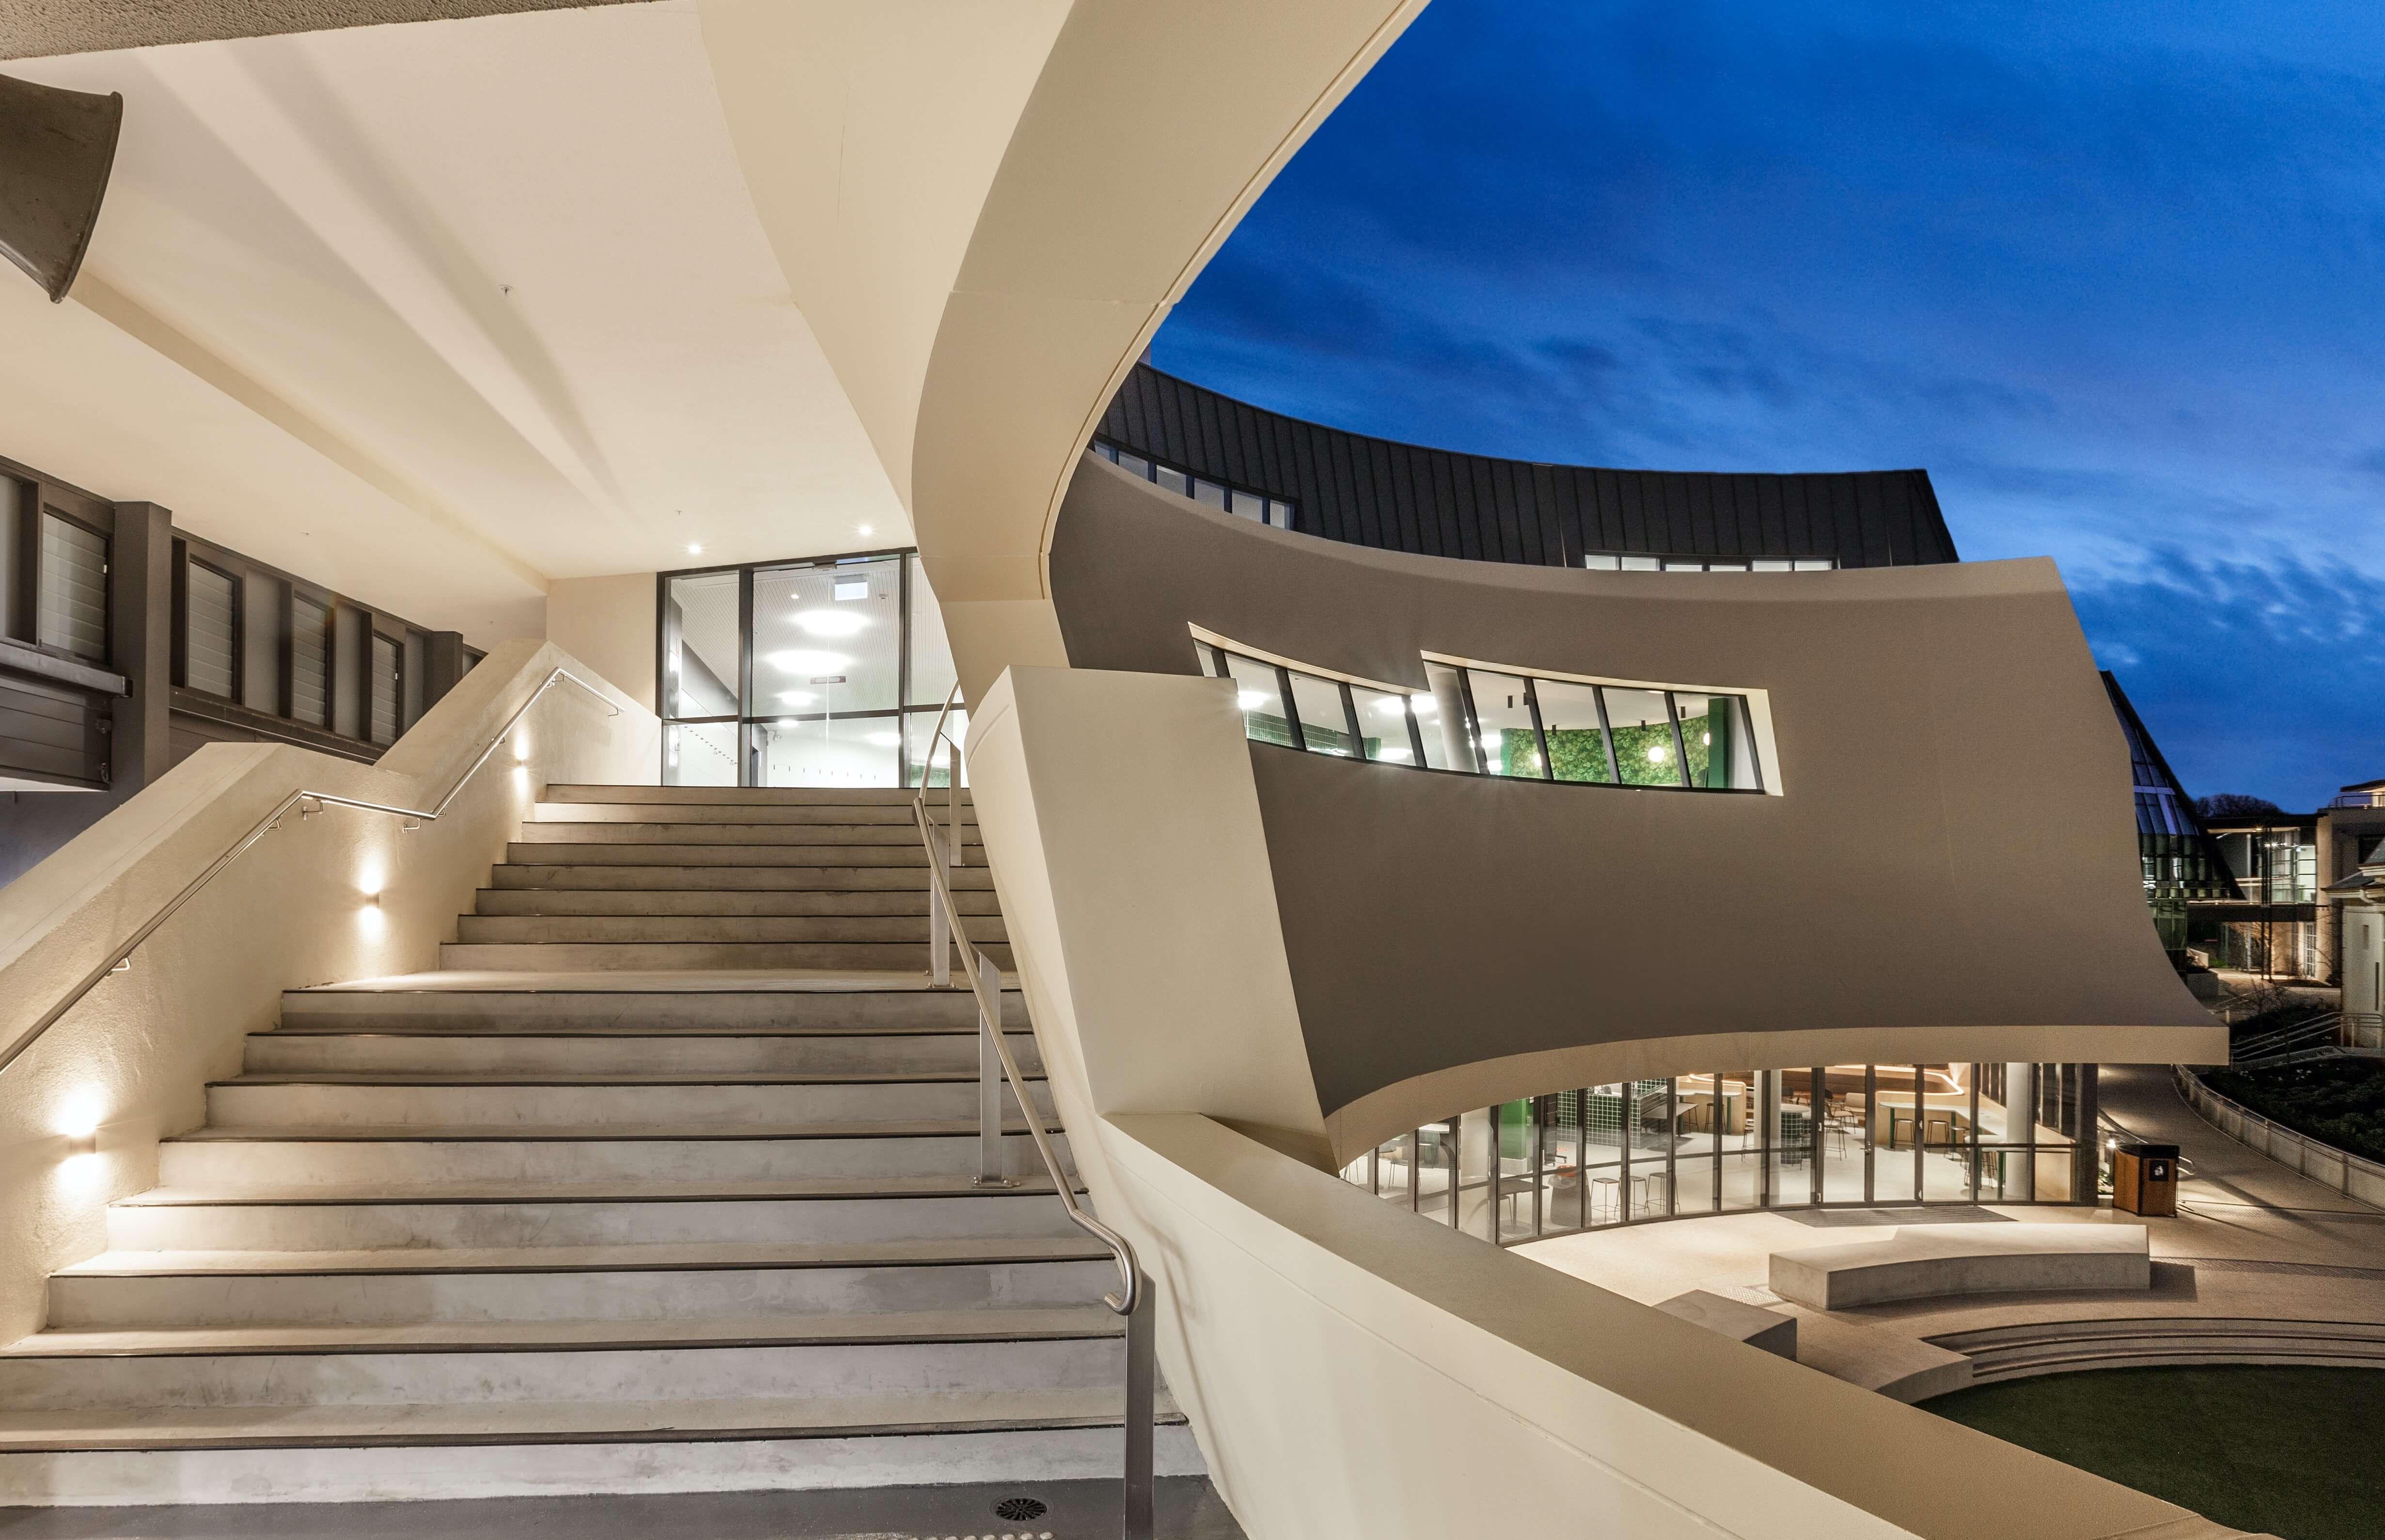 Asurco installation of glass-fibre reinforced concrete